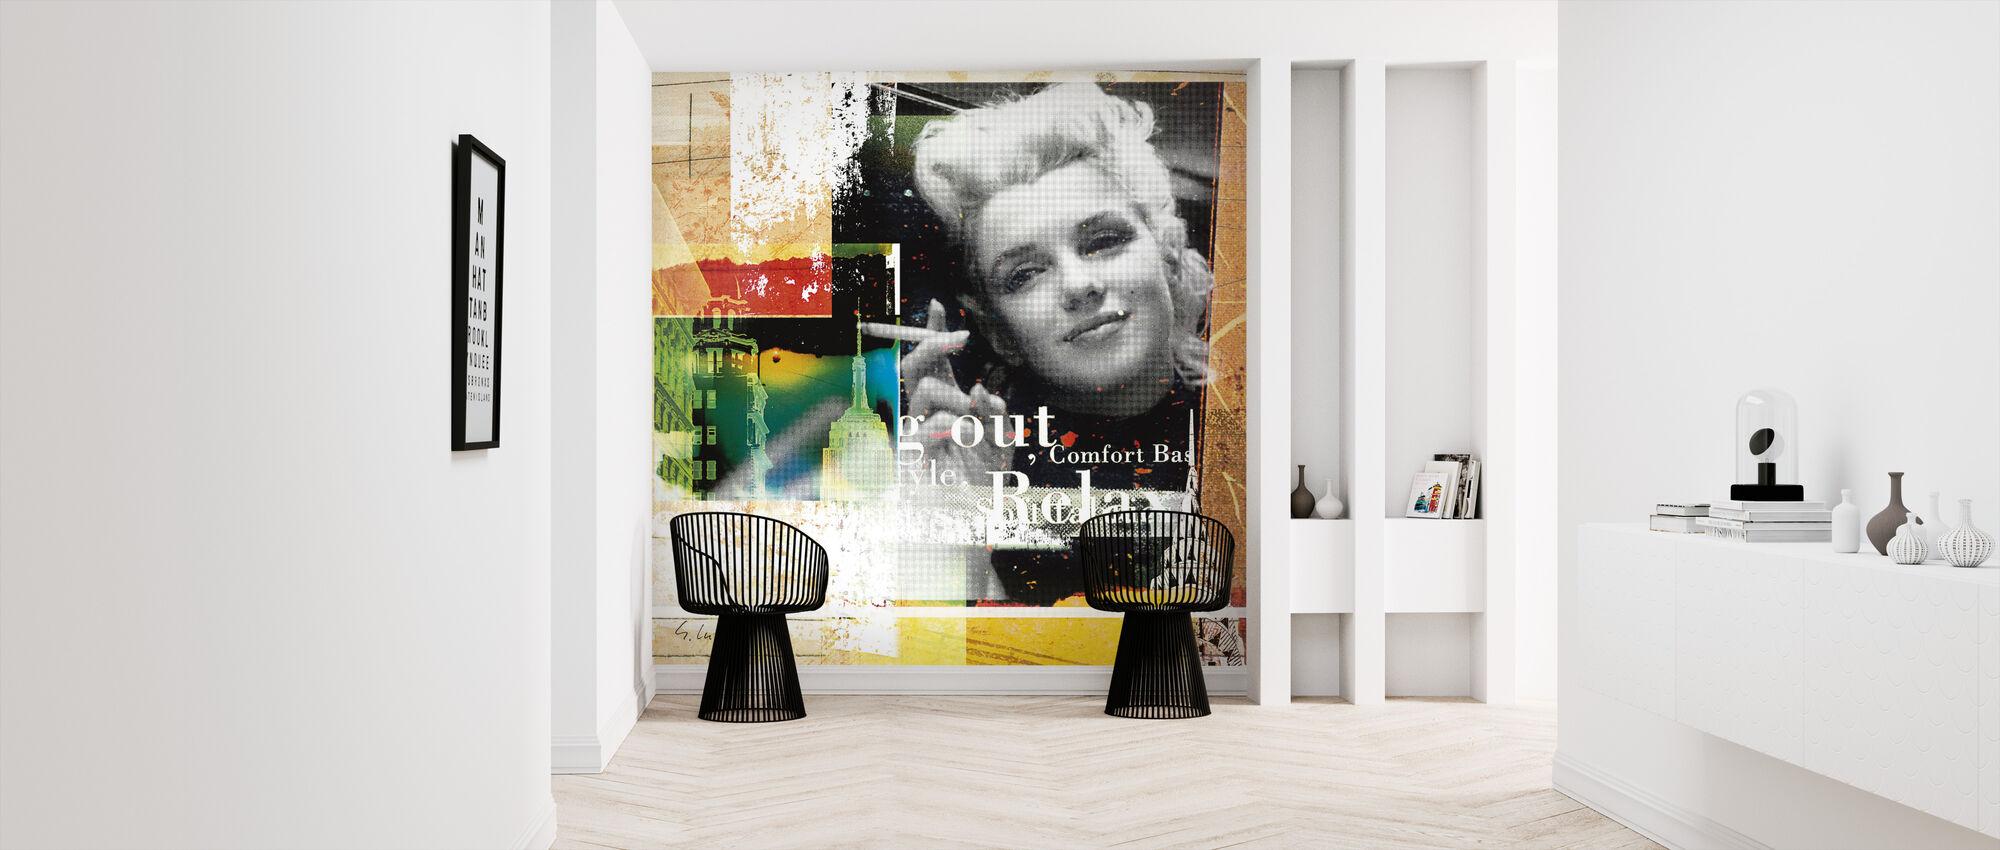 Marilyn Relax - Wallpaper - Hallway